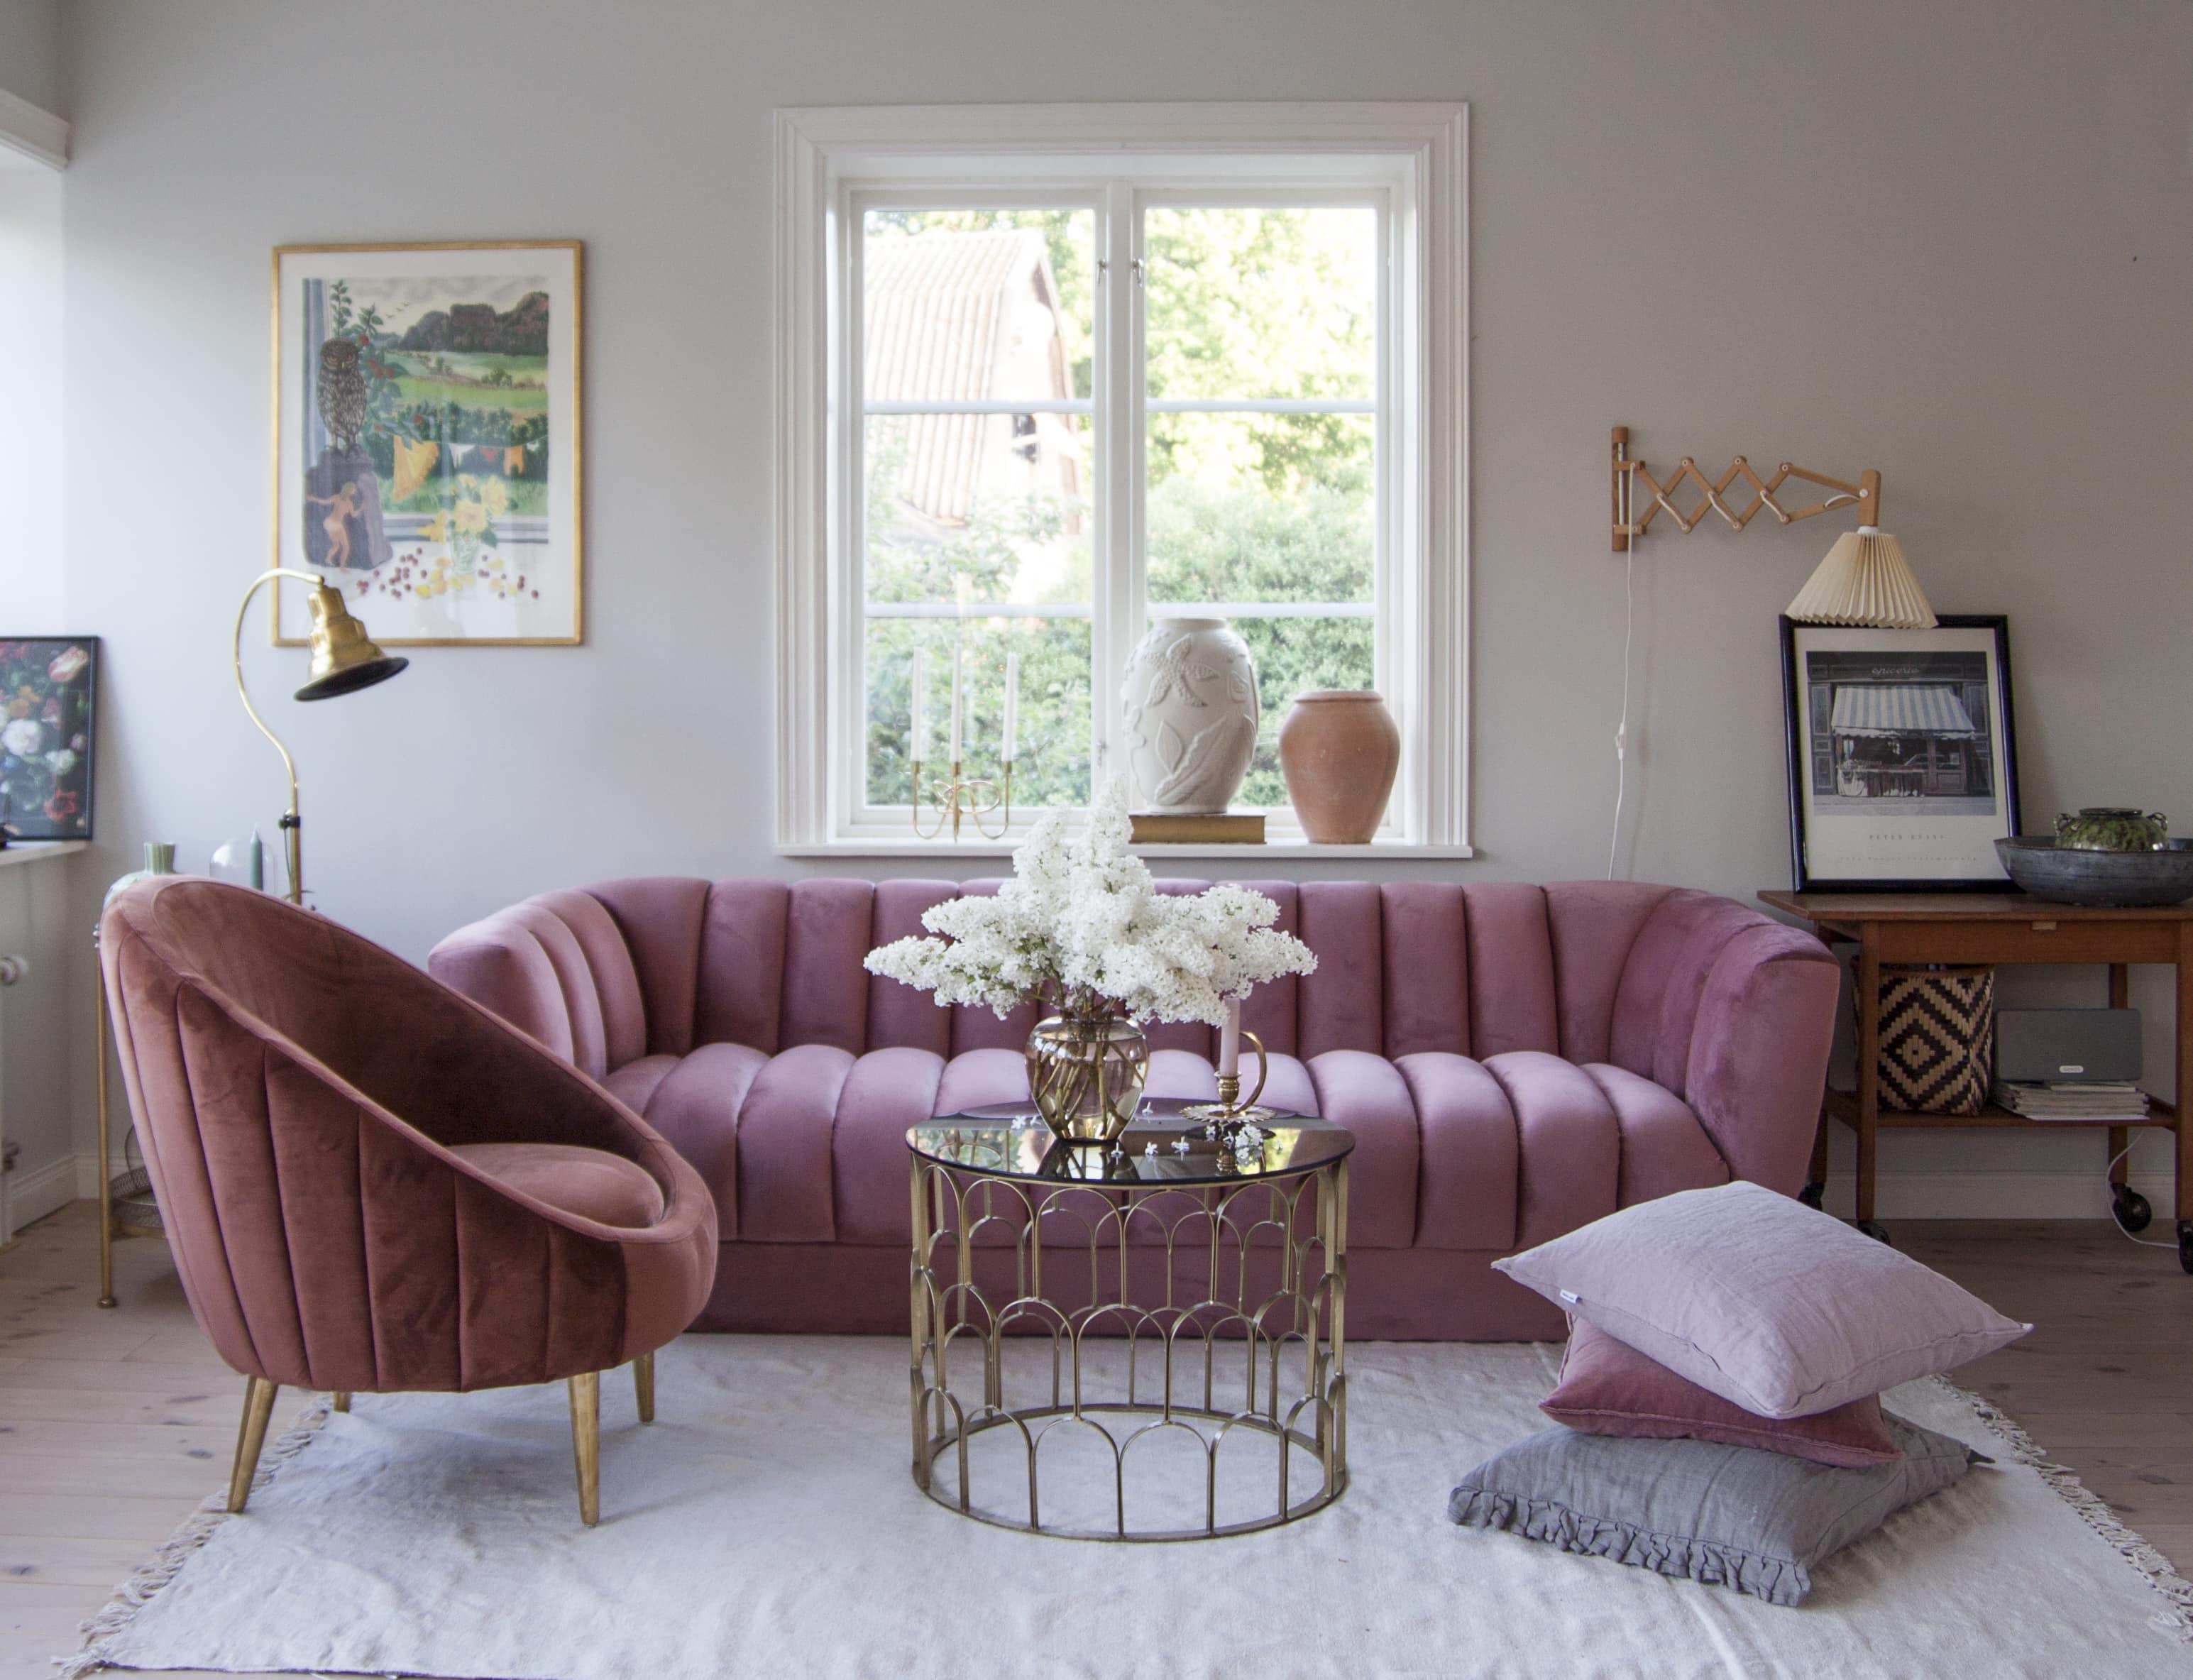 Scandinavian Design Swedish Ar Deco Home Tour | Apartment Therapy